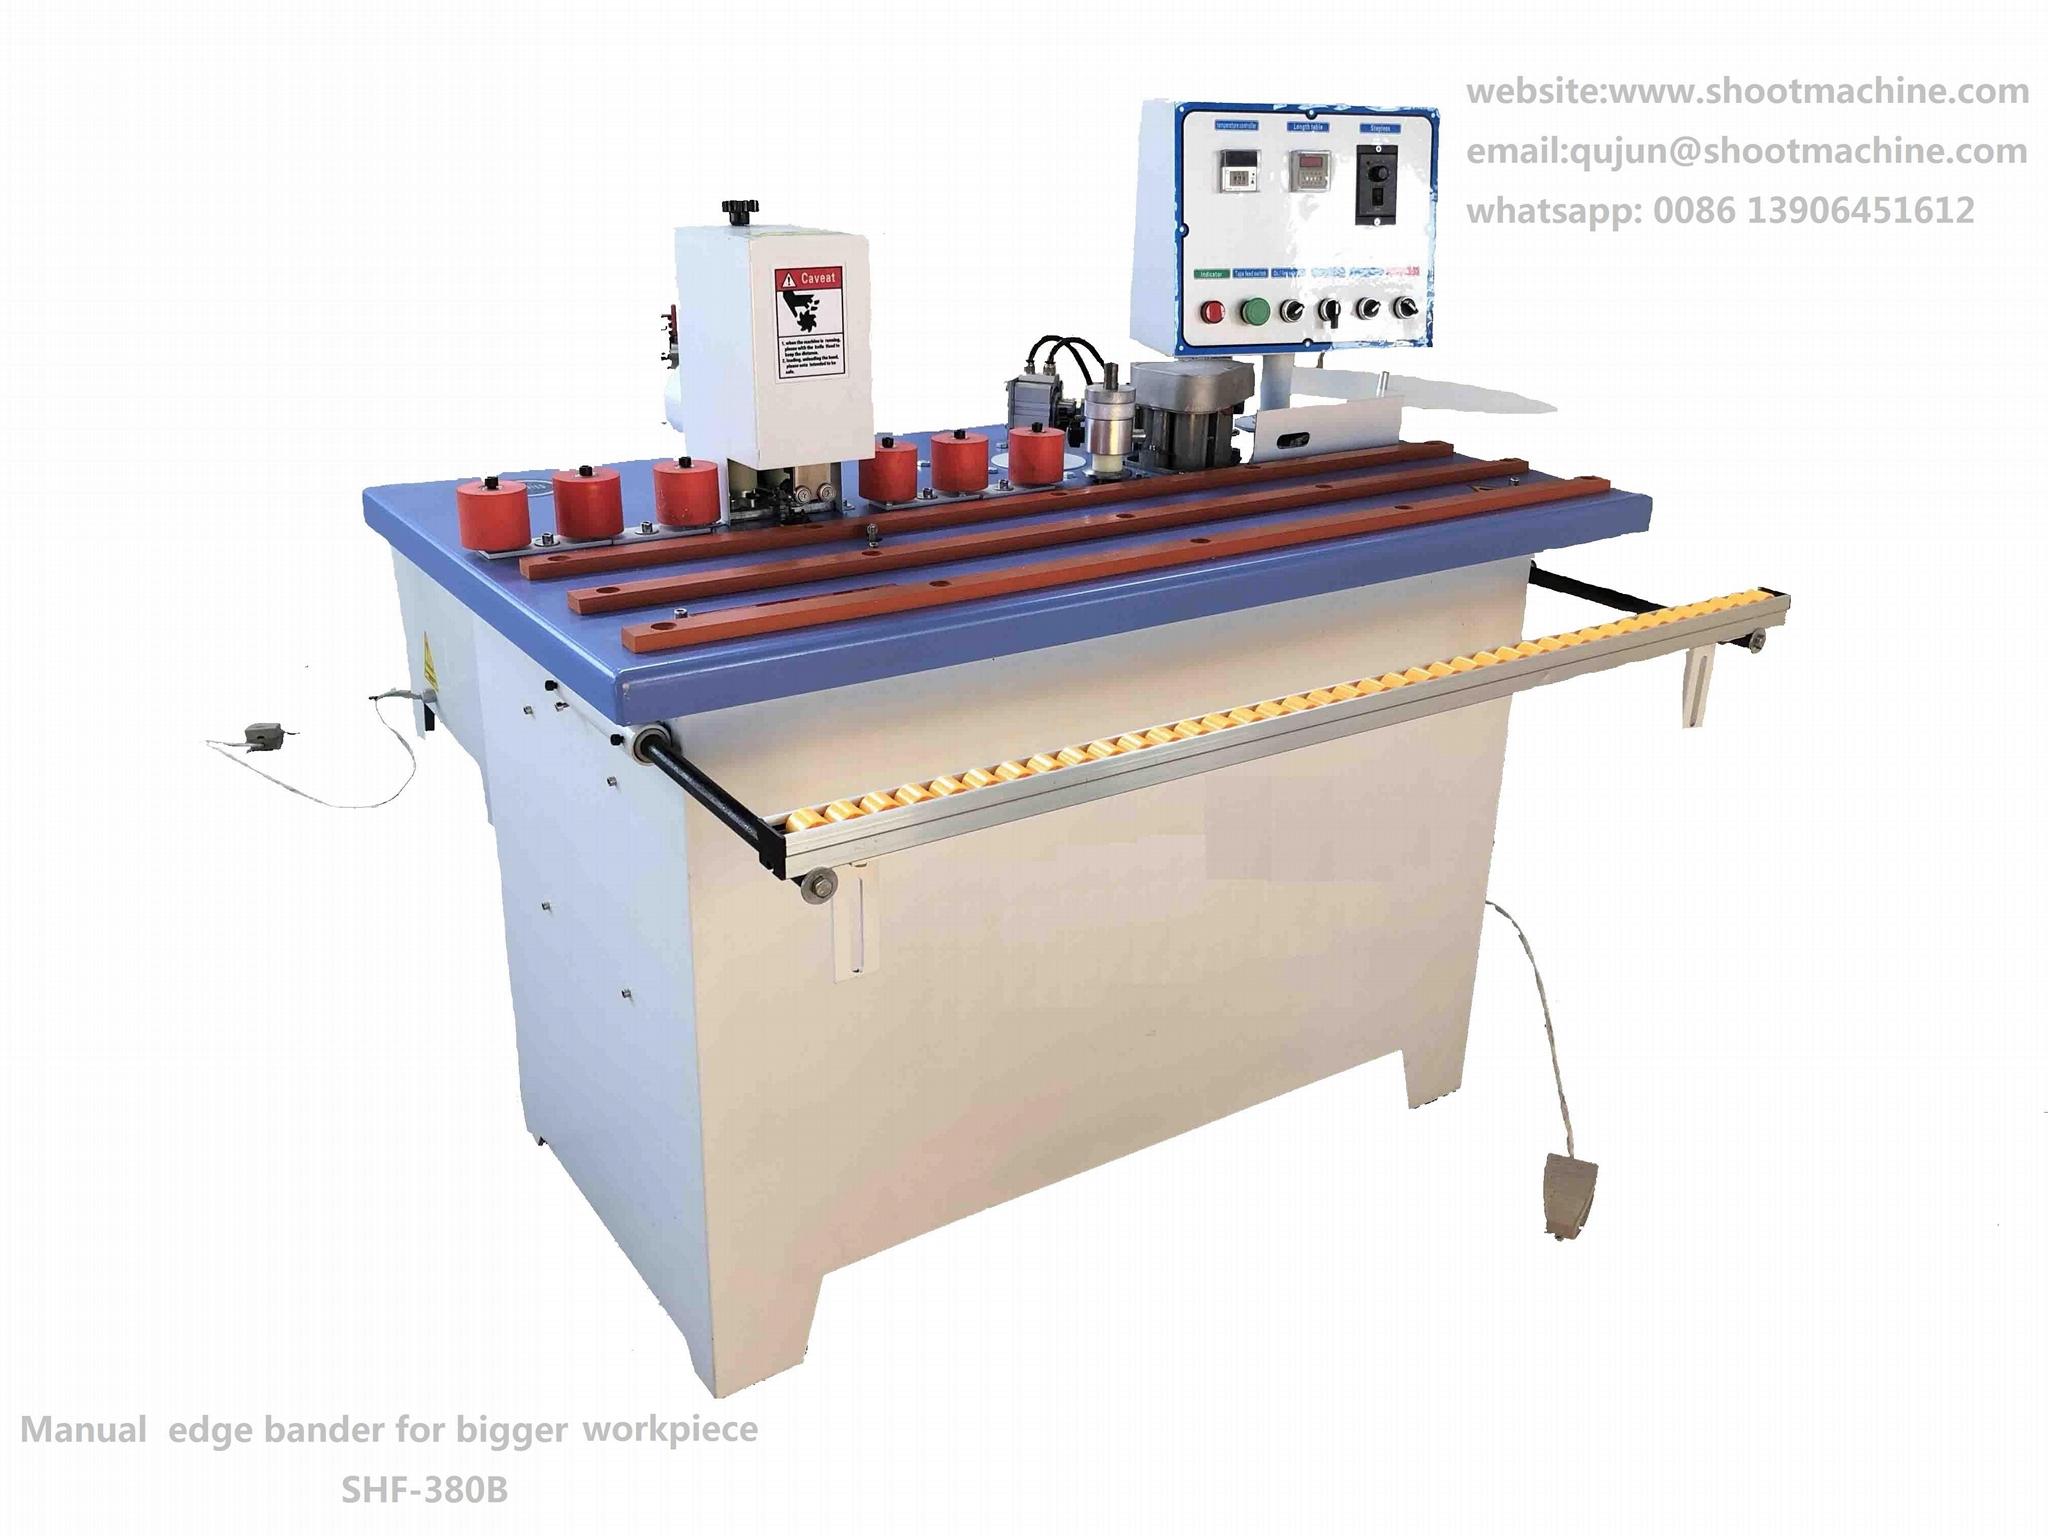 woodworking machine edge banding machine with trimming function, SHF-380B